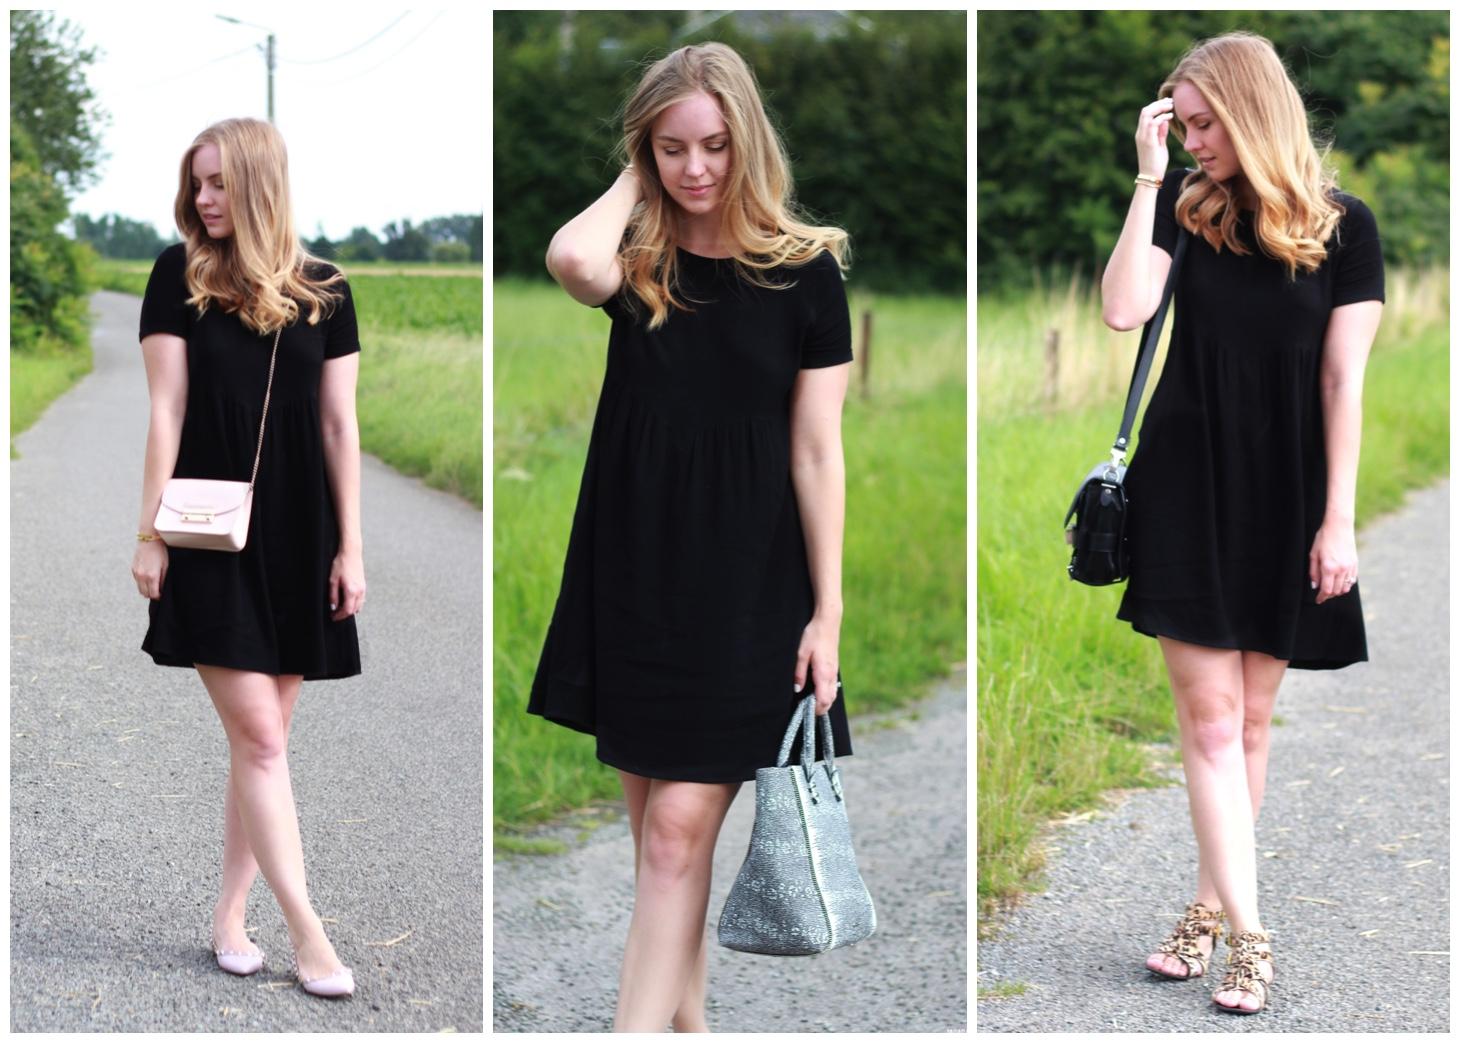 3 ways to wear a little black dress this summer